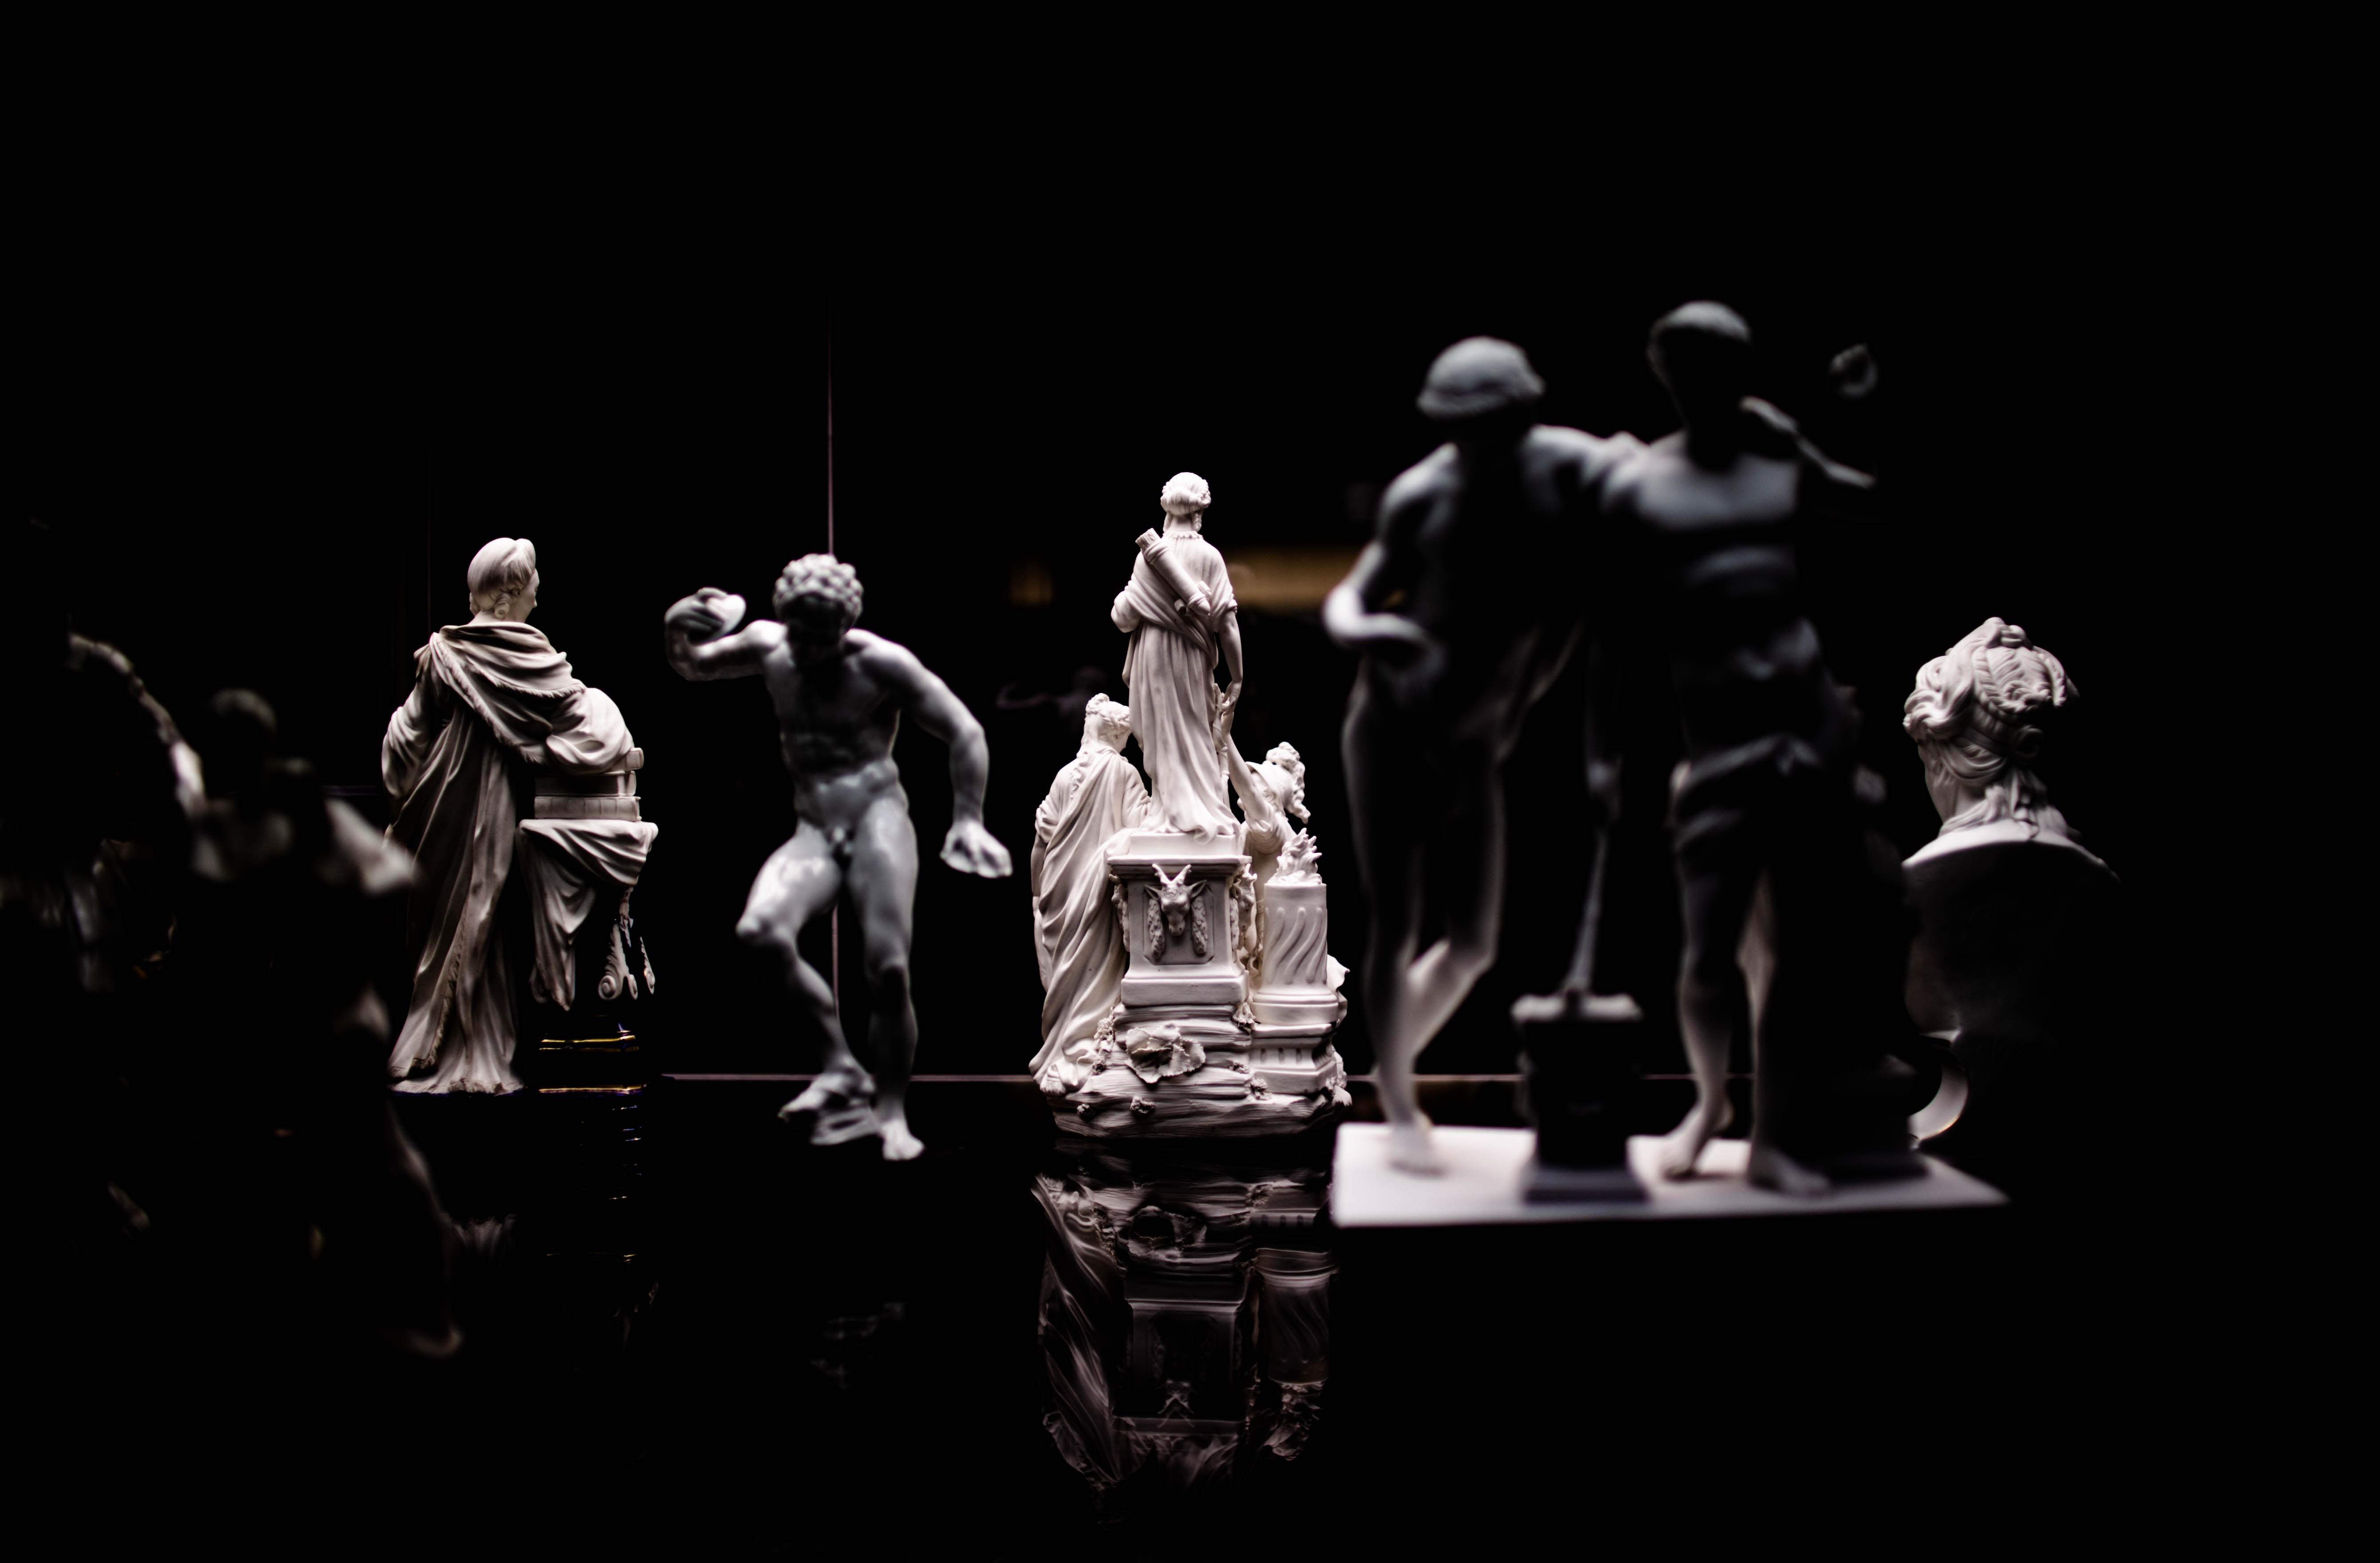 black and white ceramic figurine